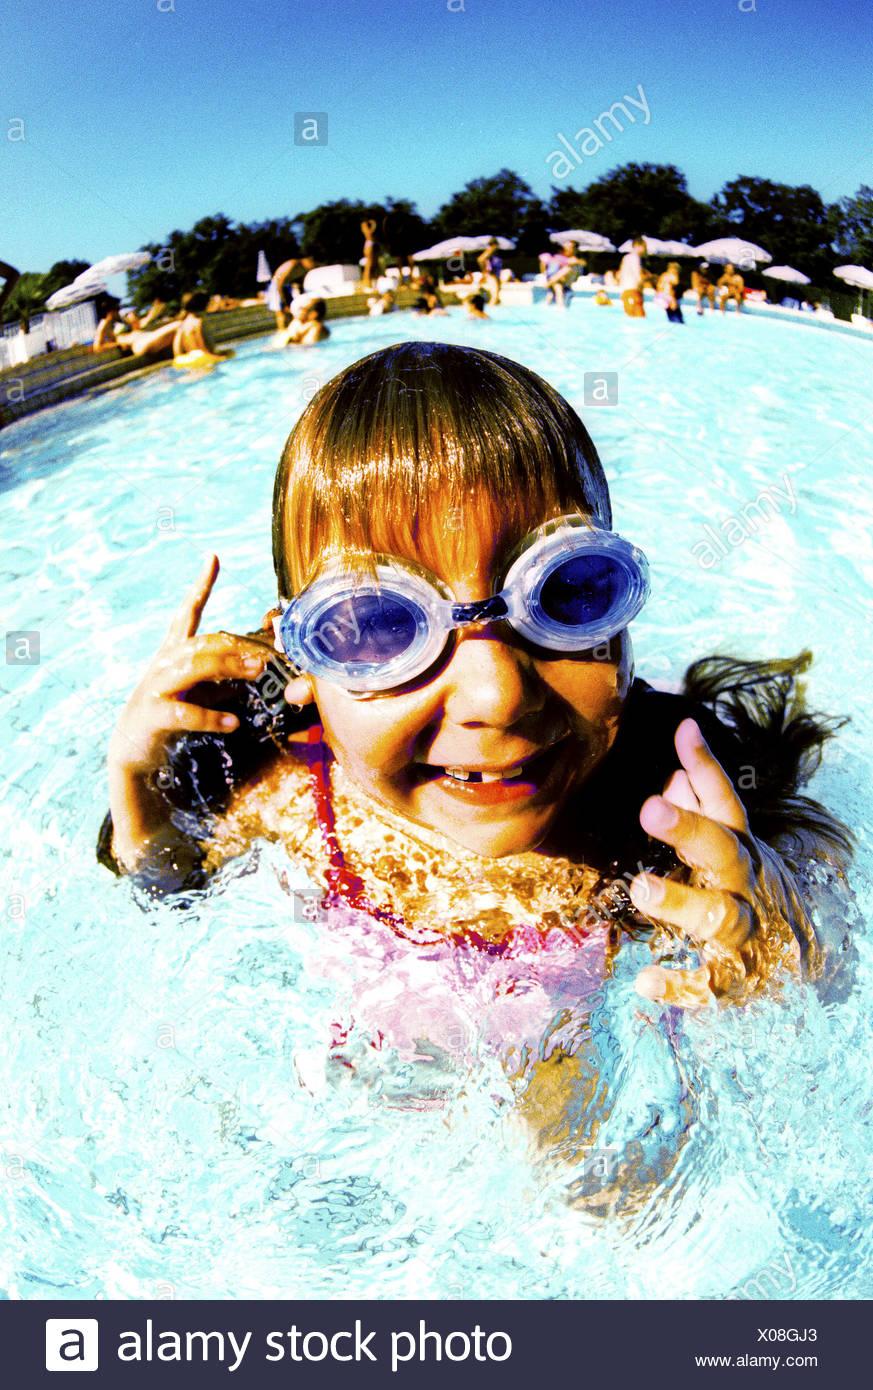 Chica (6-7) en la piscina, Retrato Imagen De Stock